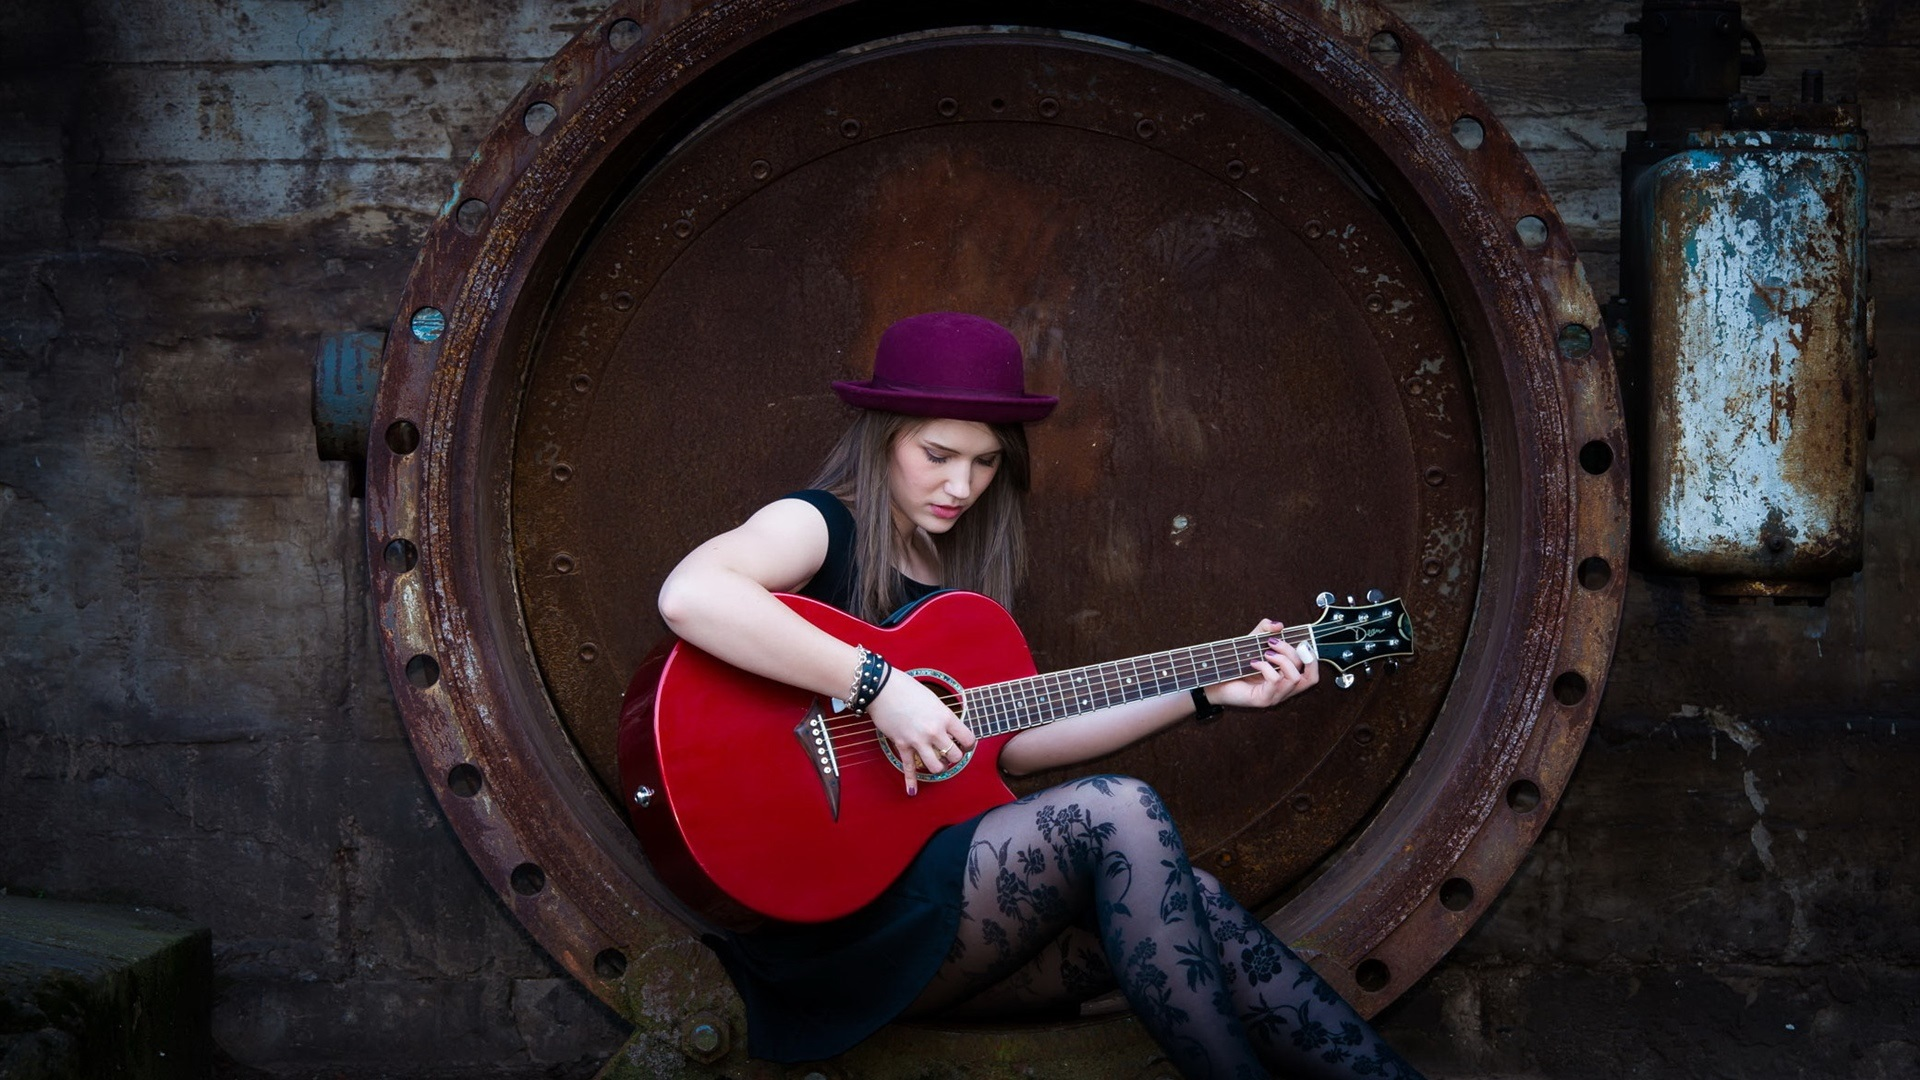 wallpaper long hair girl hat guitar music 1920x1080 full hd 2k